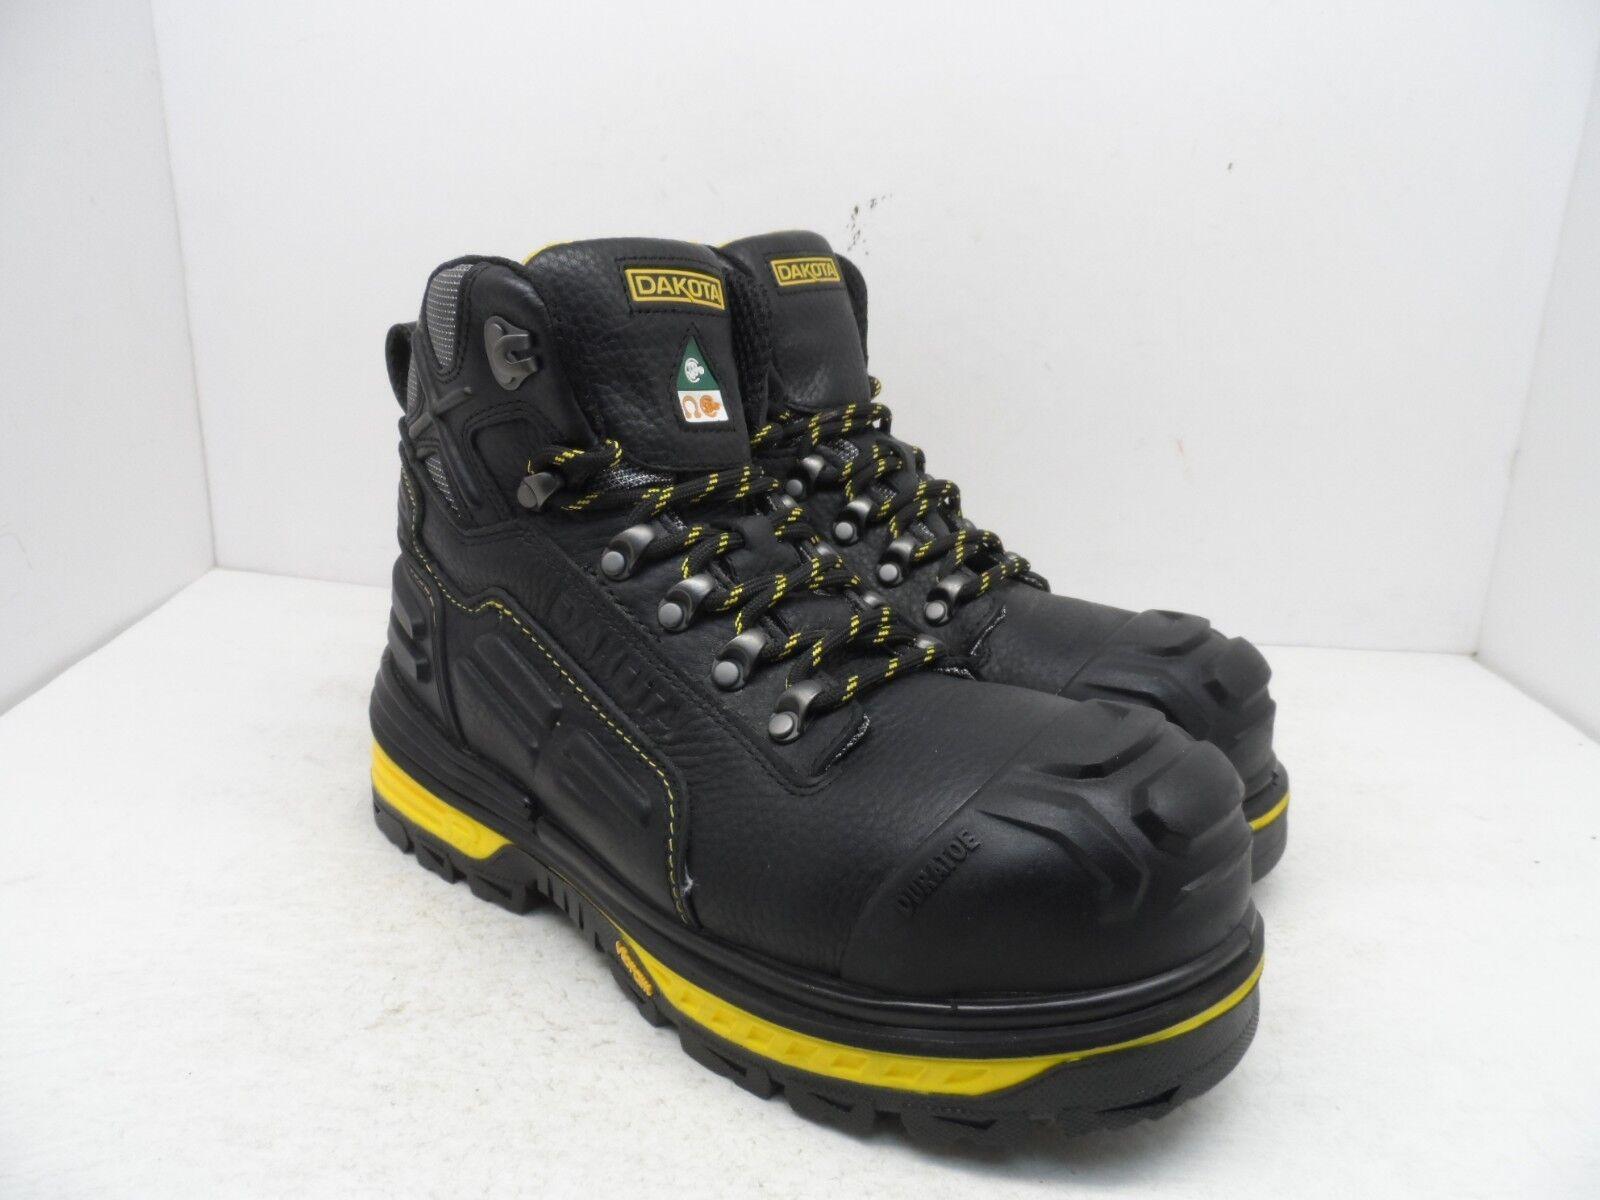 DAKOTA para hombres 6  Ctcp Vibram Arctic Grip Pro botas De Trabajo Negro amarillo Tamaño 9M